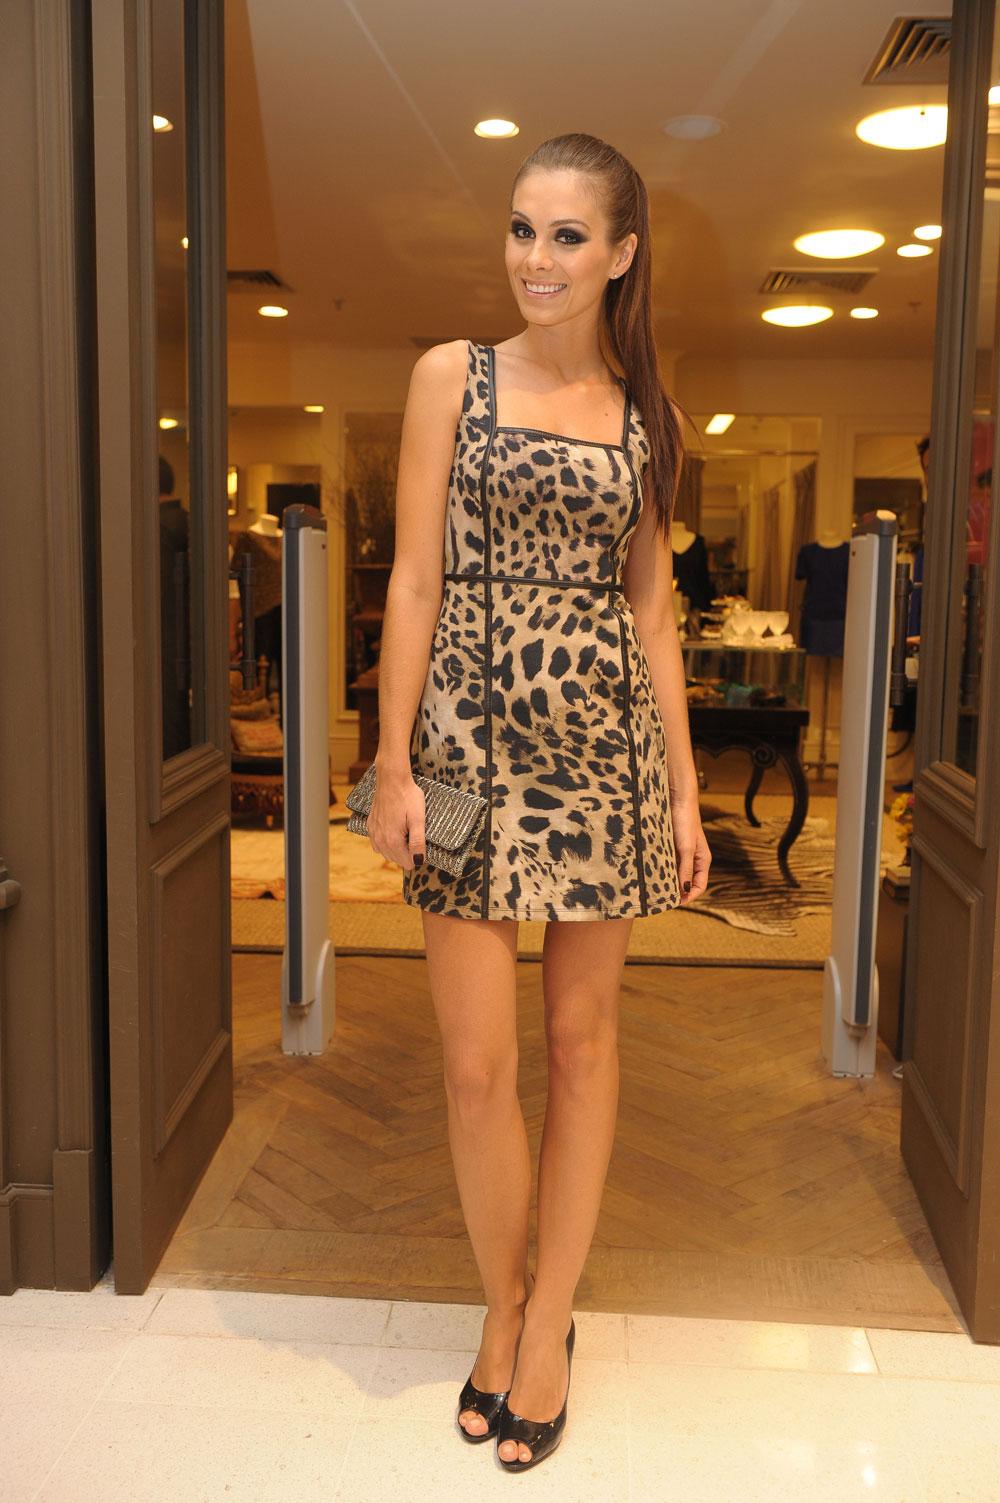 gabriela markus, miss brasil 2012. Lnzgahld